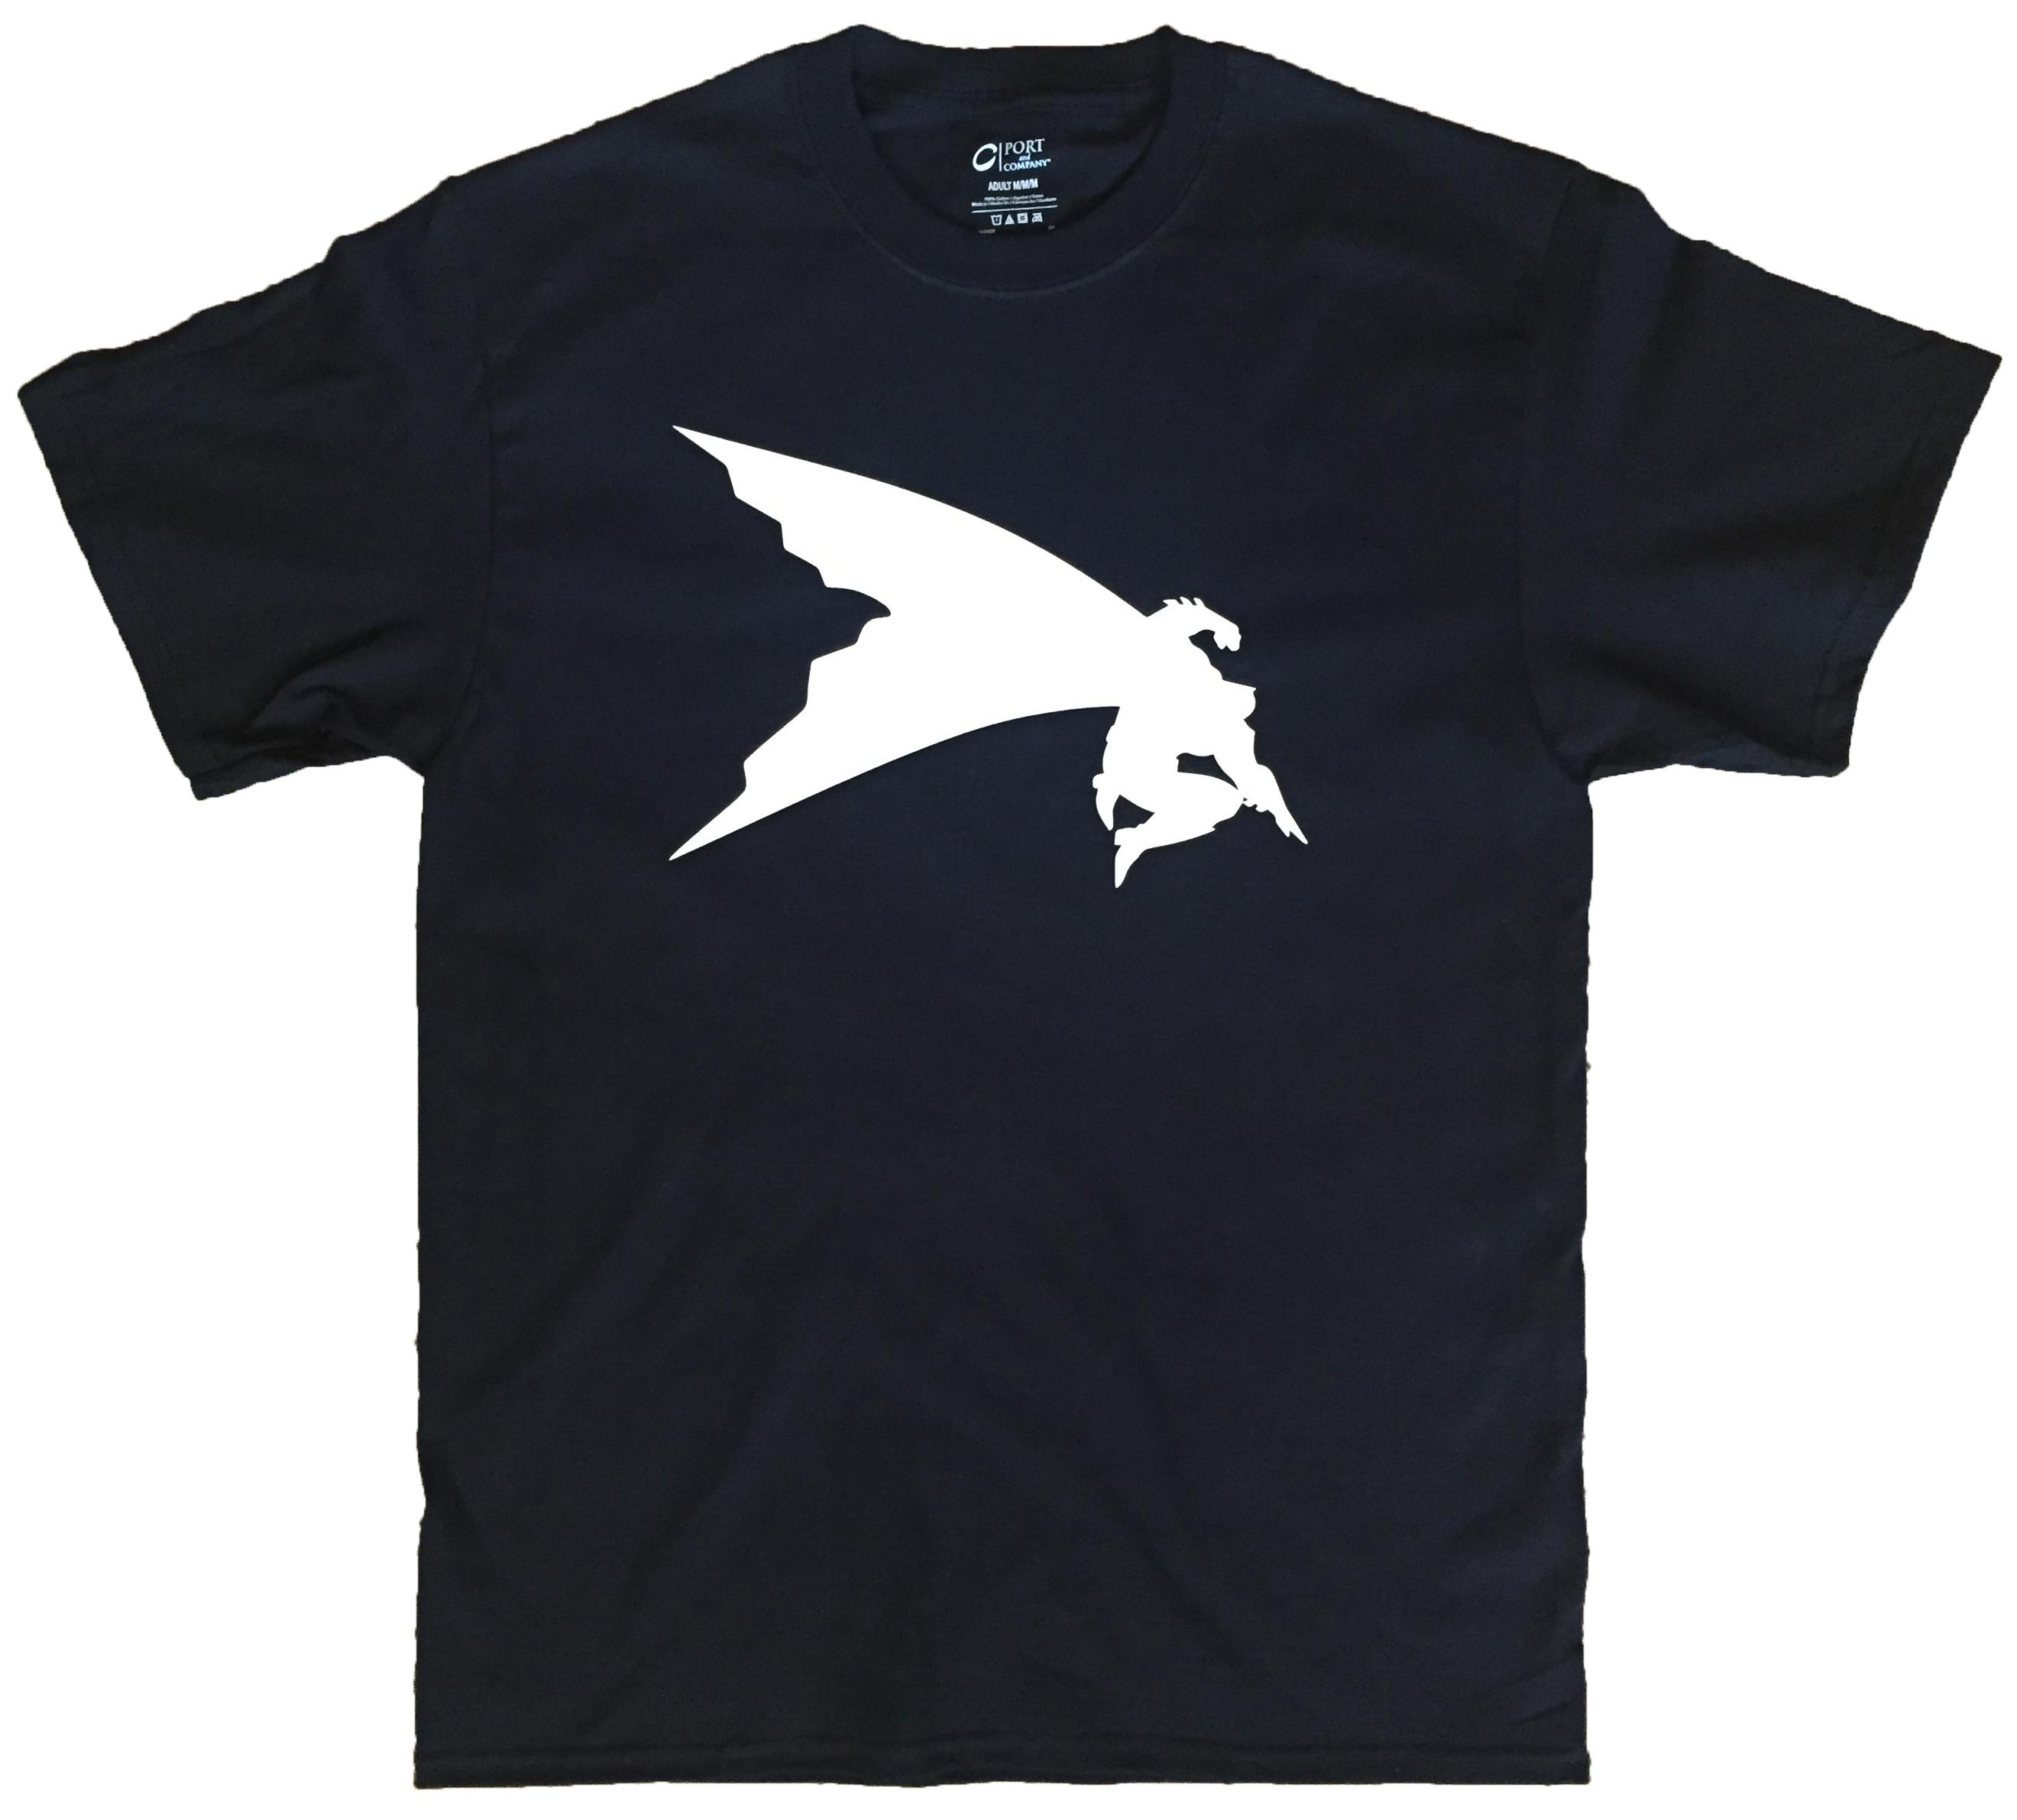 Flying Batman T-Shirt · Top Notch Custom Apparel · Online Store ...